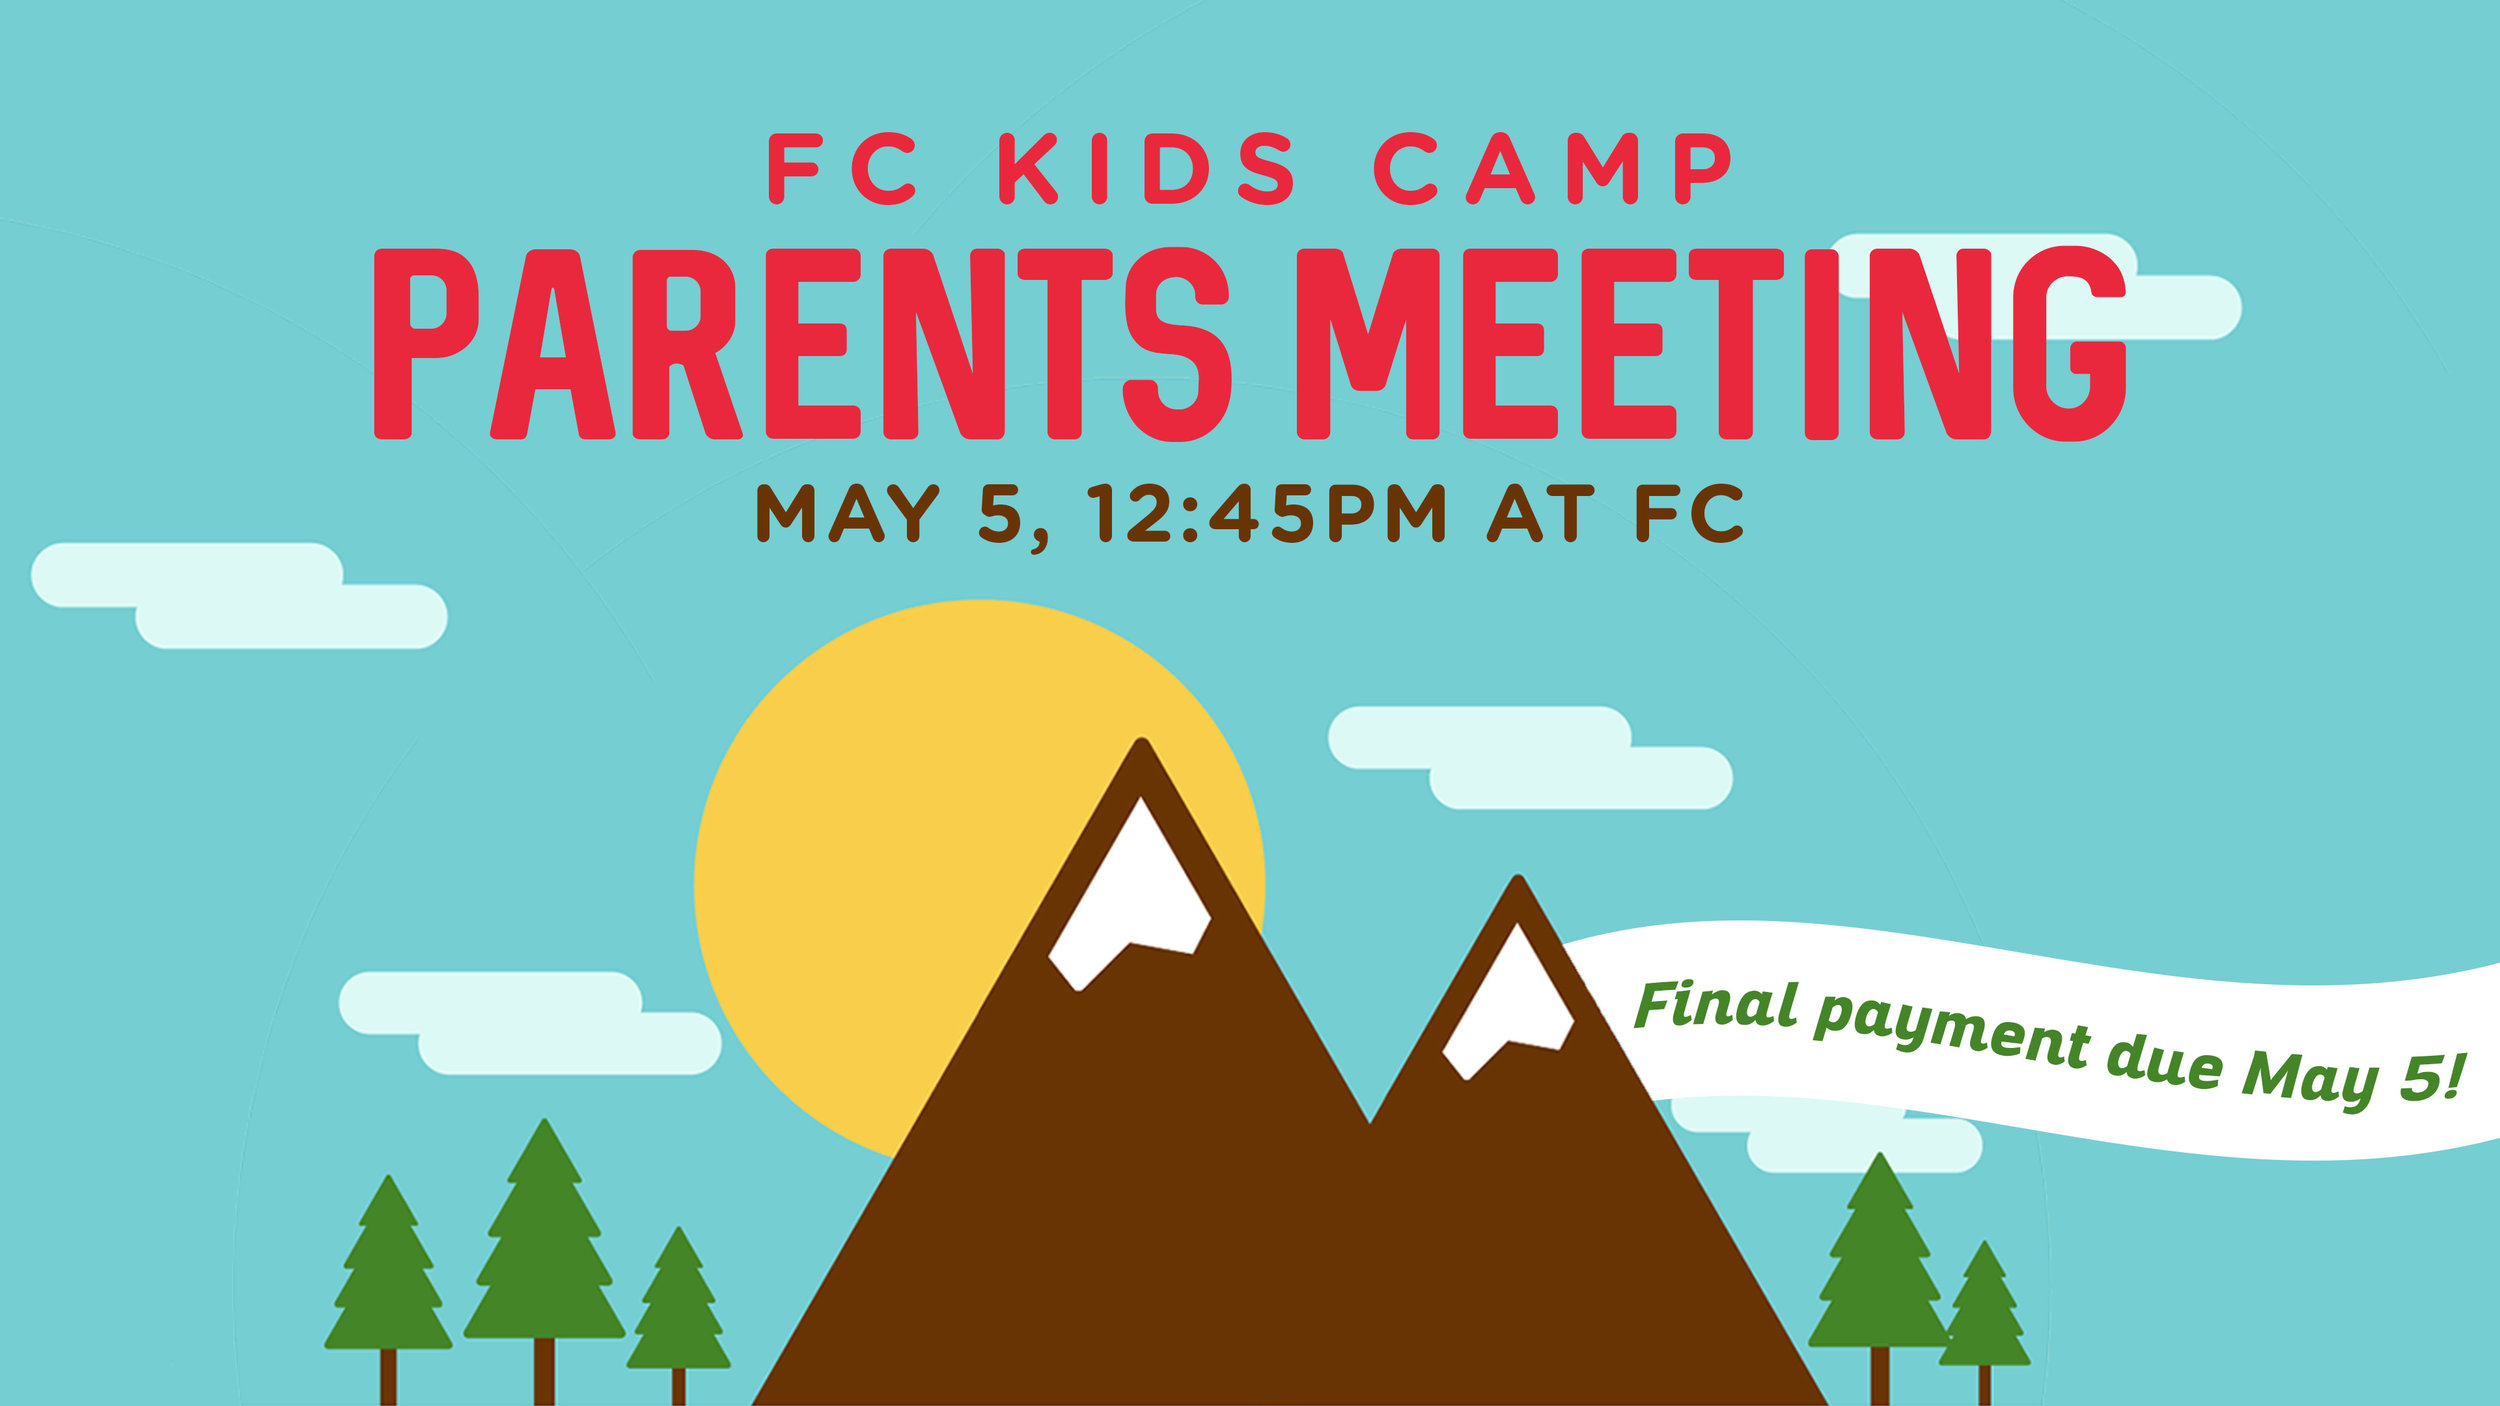 Kids Camp Parents Meeting.jpg